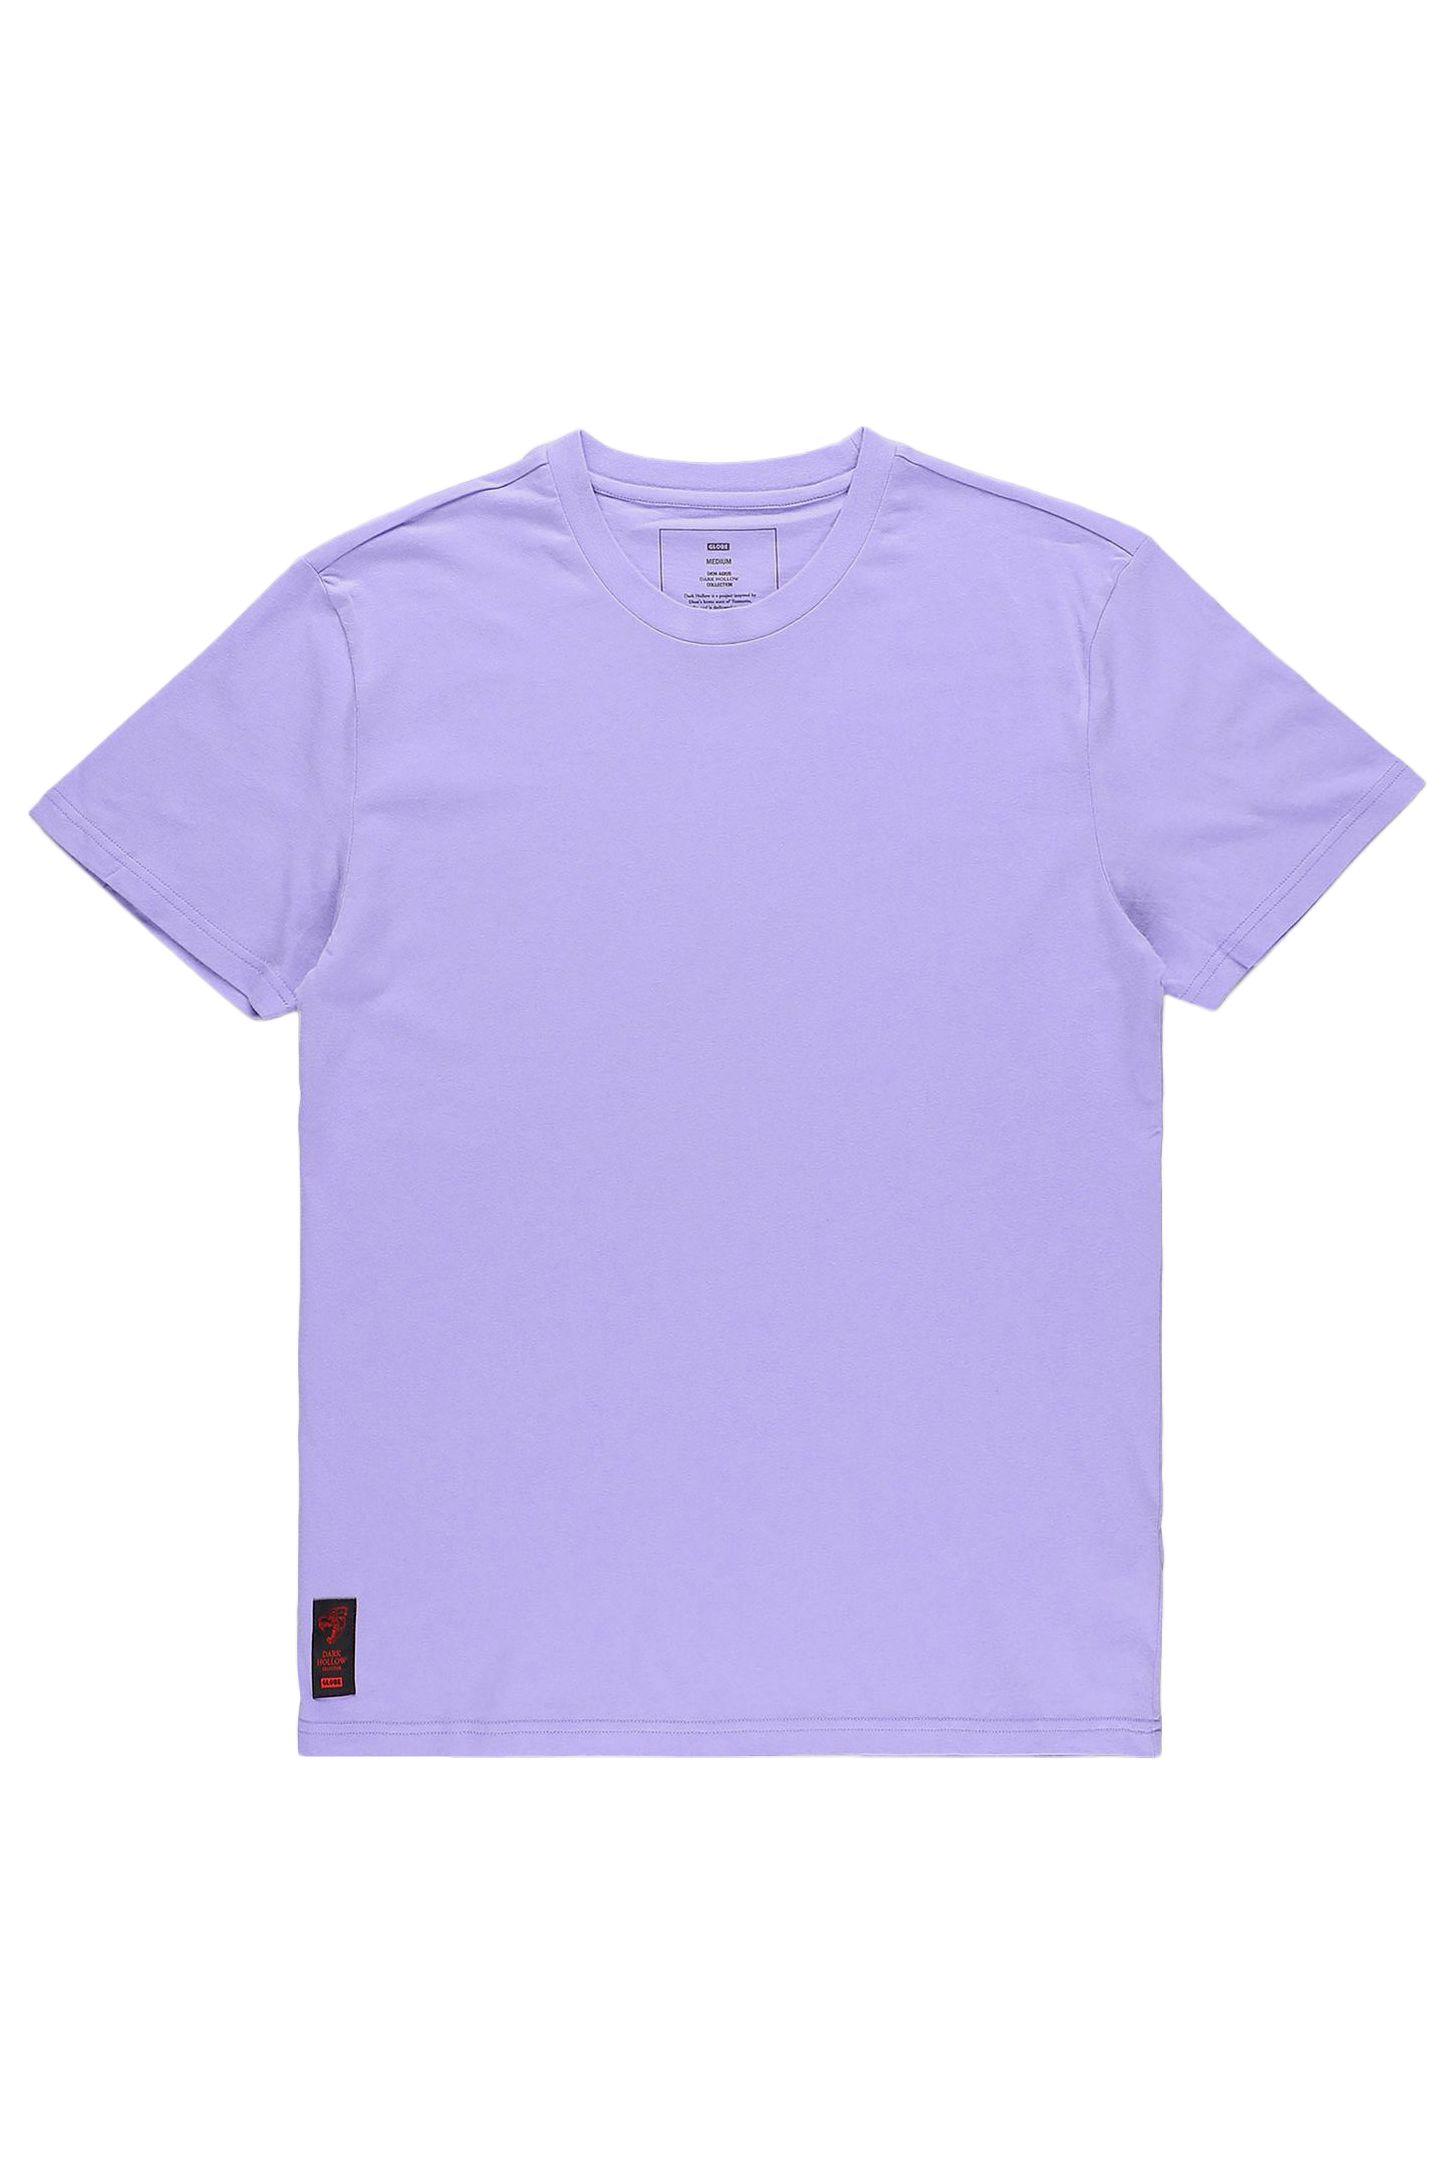 Globe T-Shirt DION AGIUS TASI TEE Nitro Grape